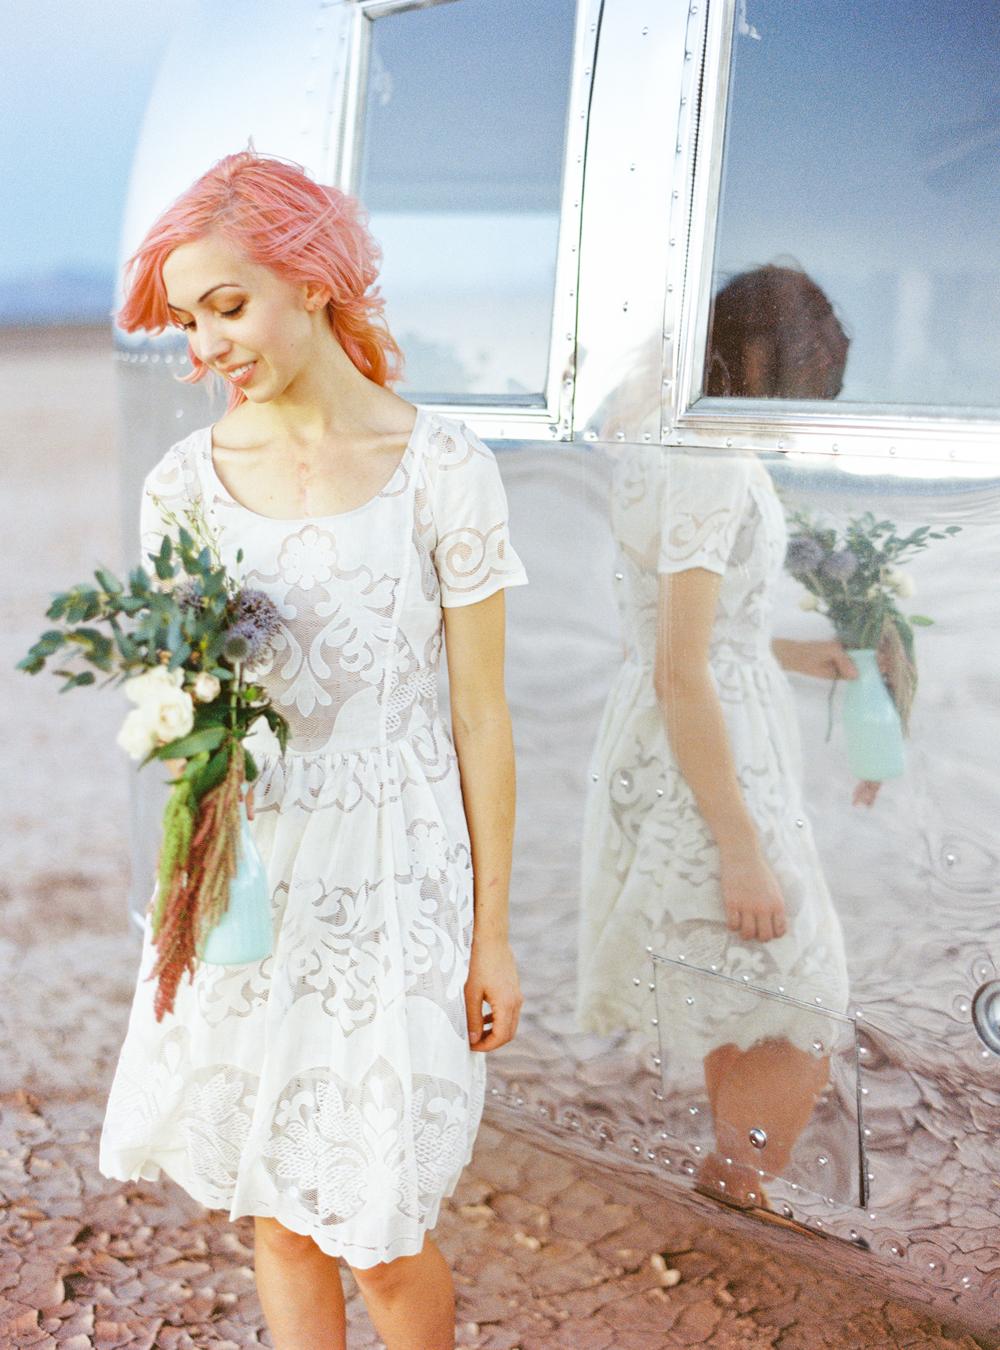 Ultimate Vegas Wedding Venue Guide: Retro Pop Up Weddings with Flora ...